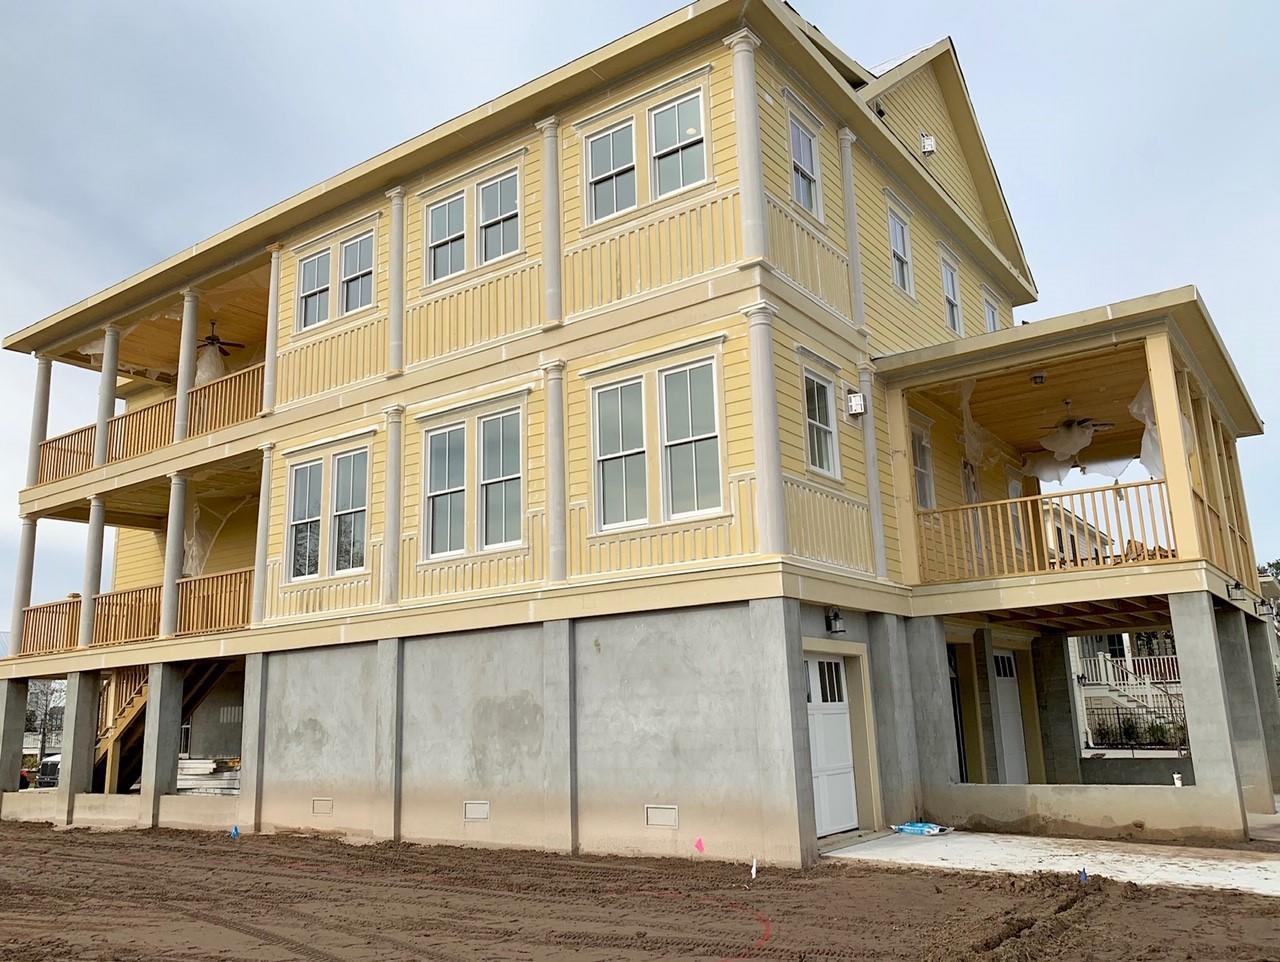 Daniel Island Homes For Sale - 206 Foundry, Charleston, SC - 3